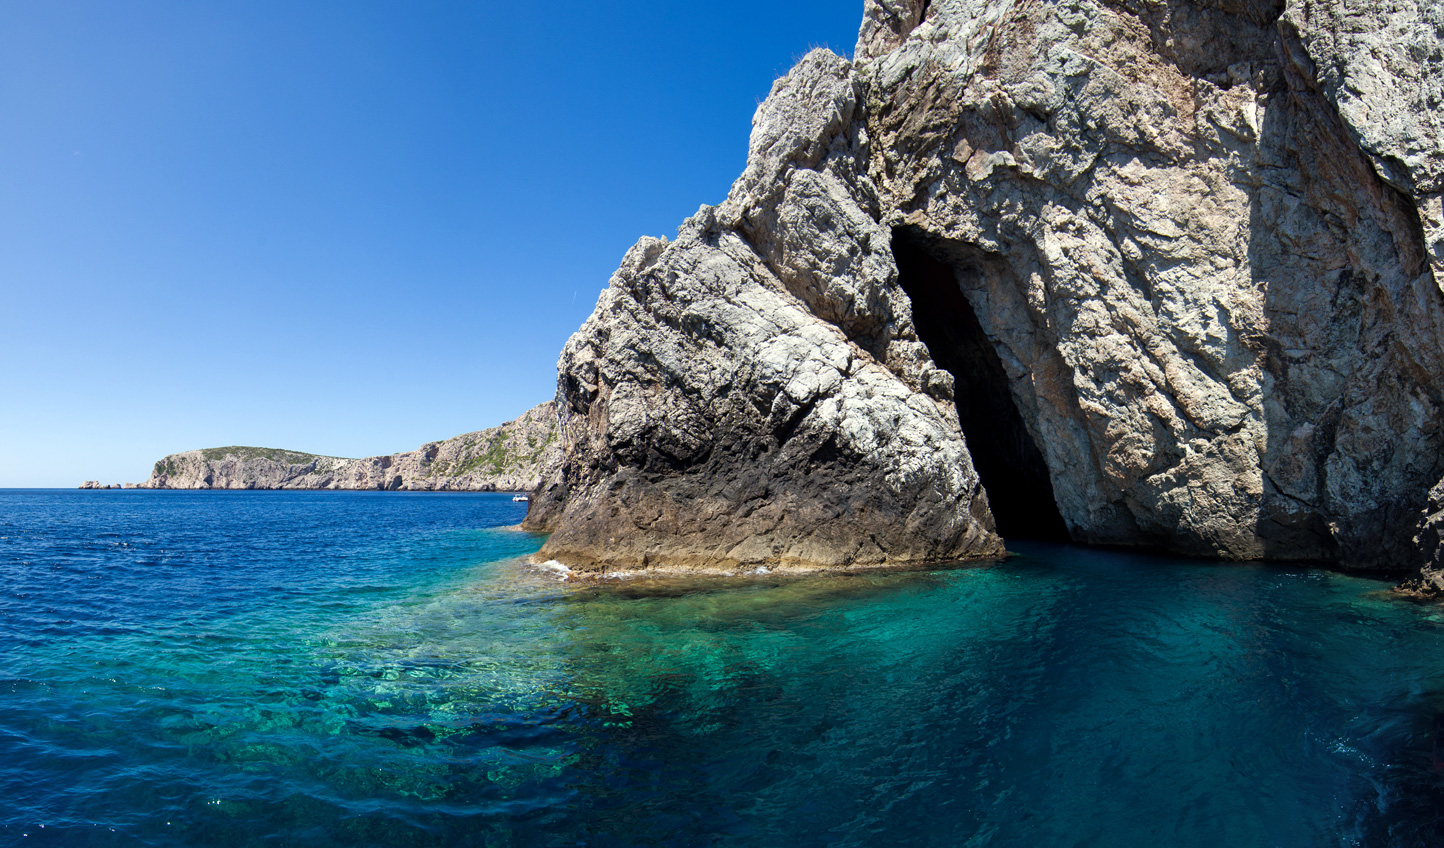 Discover hidden caves on Bisevo